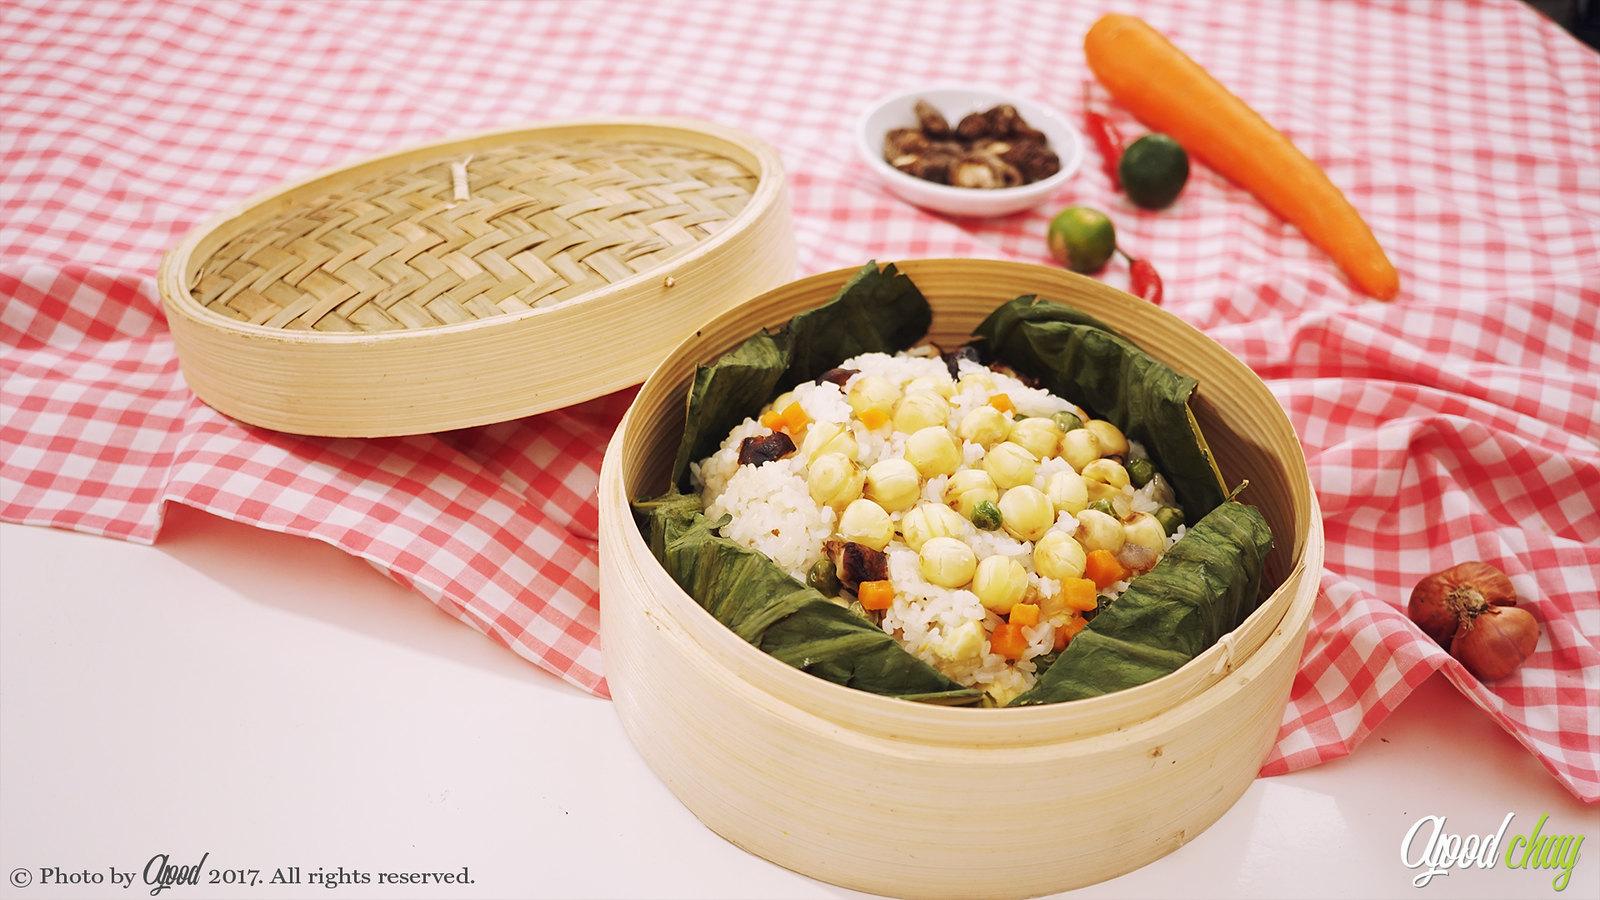 [afoodchay] | Vegetarian Steamed Rice Wrapped in Lotus Leaf – Vietnamese Vegetarian Recipe